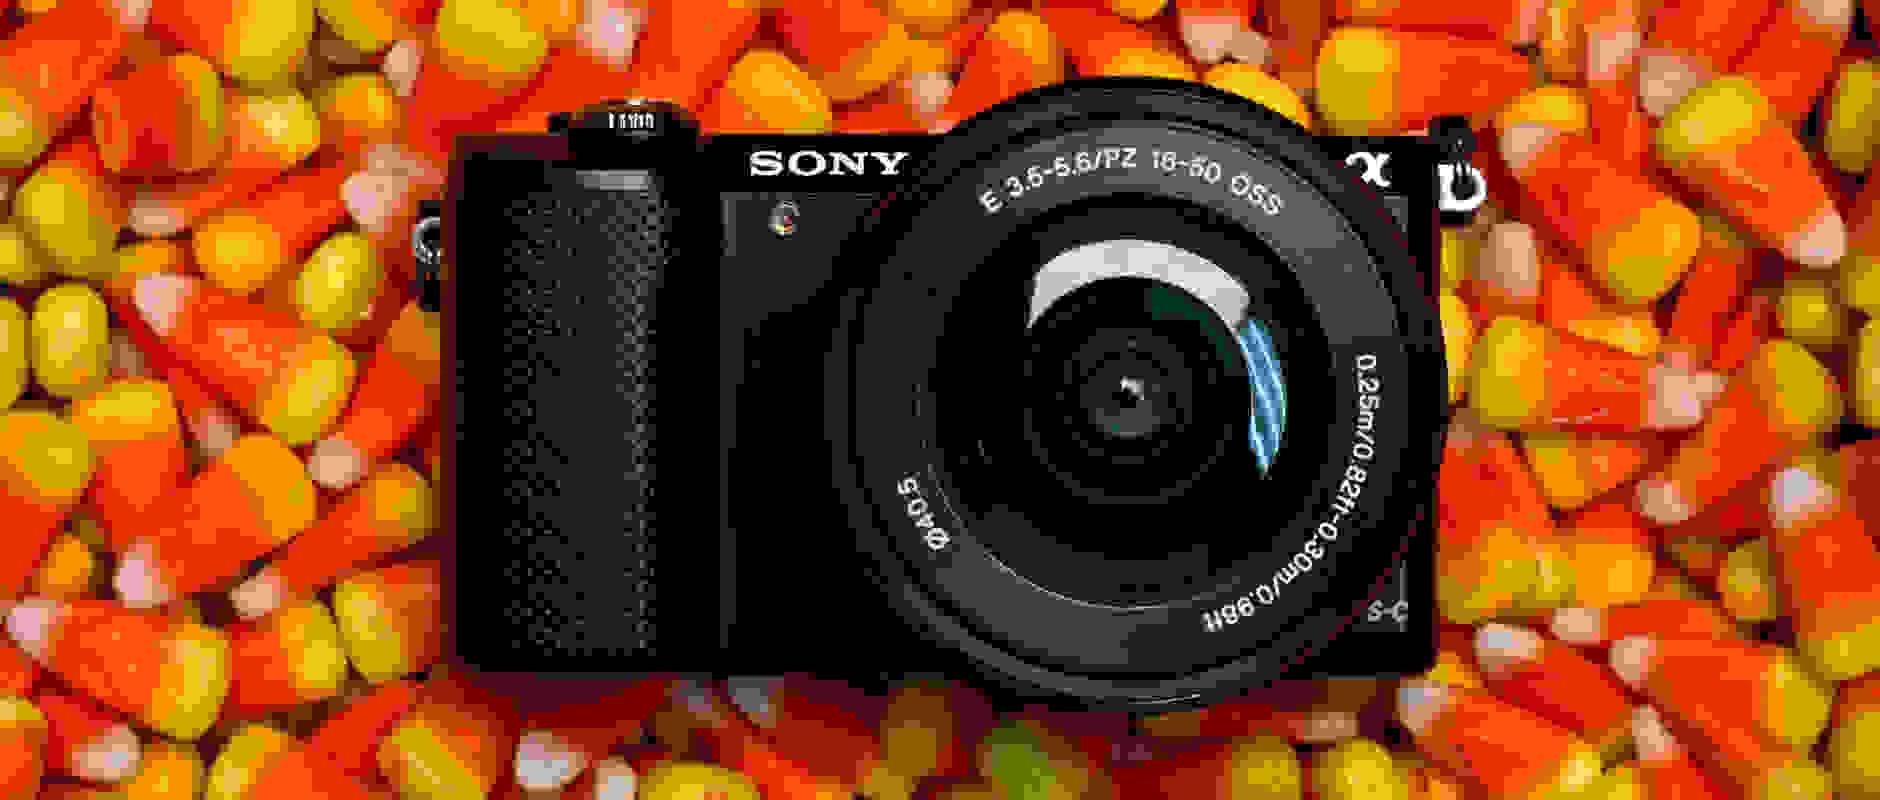 Sony Alpha A5100 Mirrorless Digital Camera Review